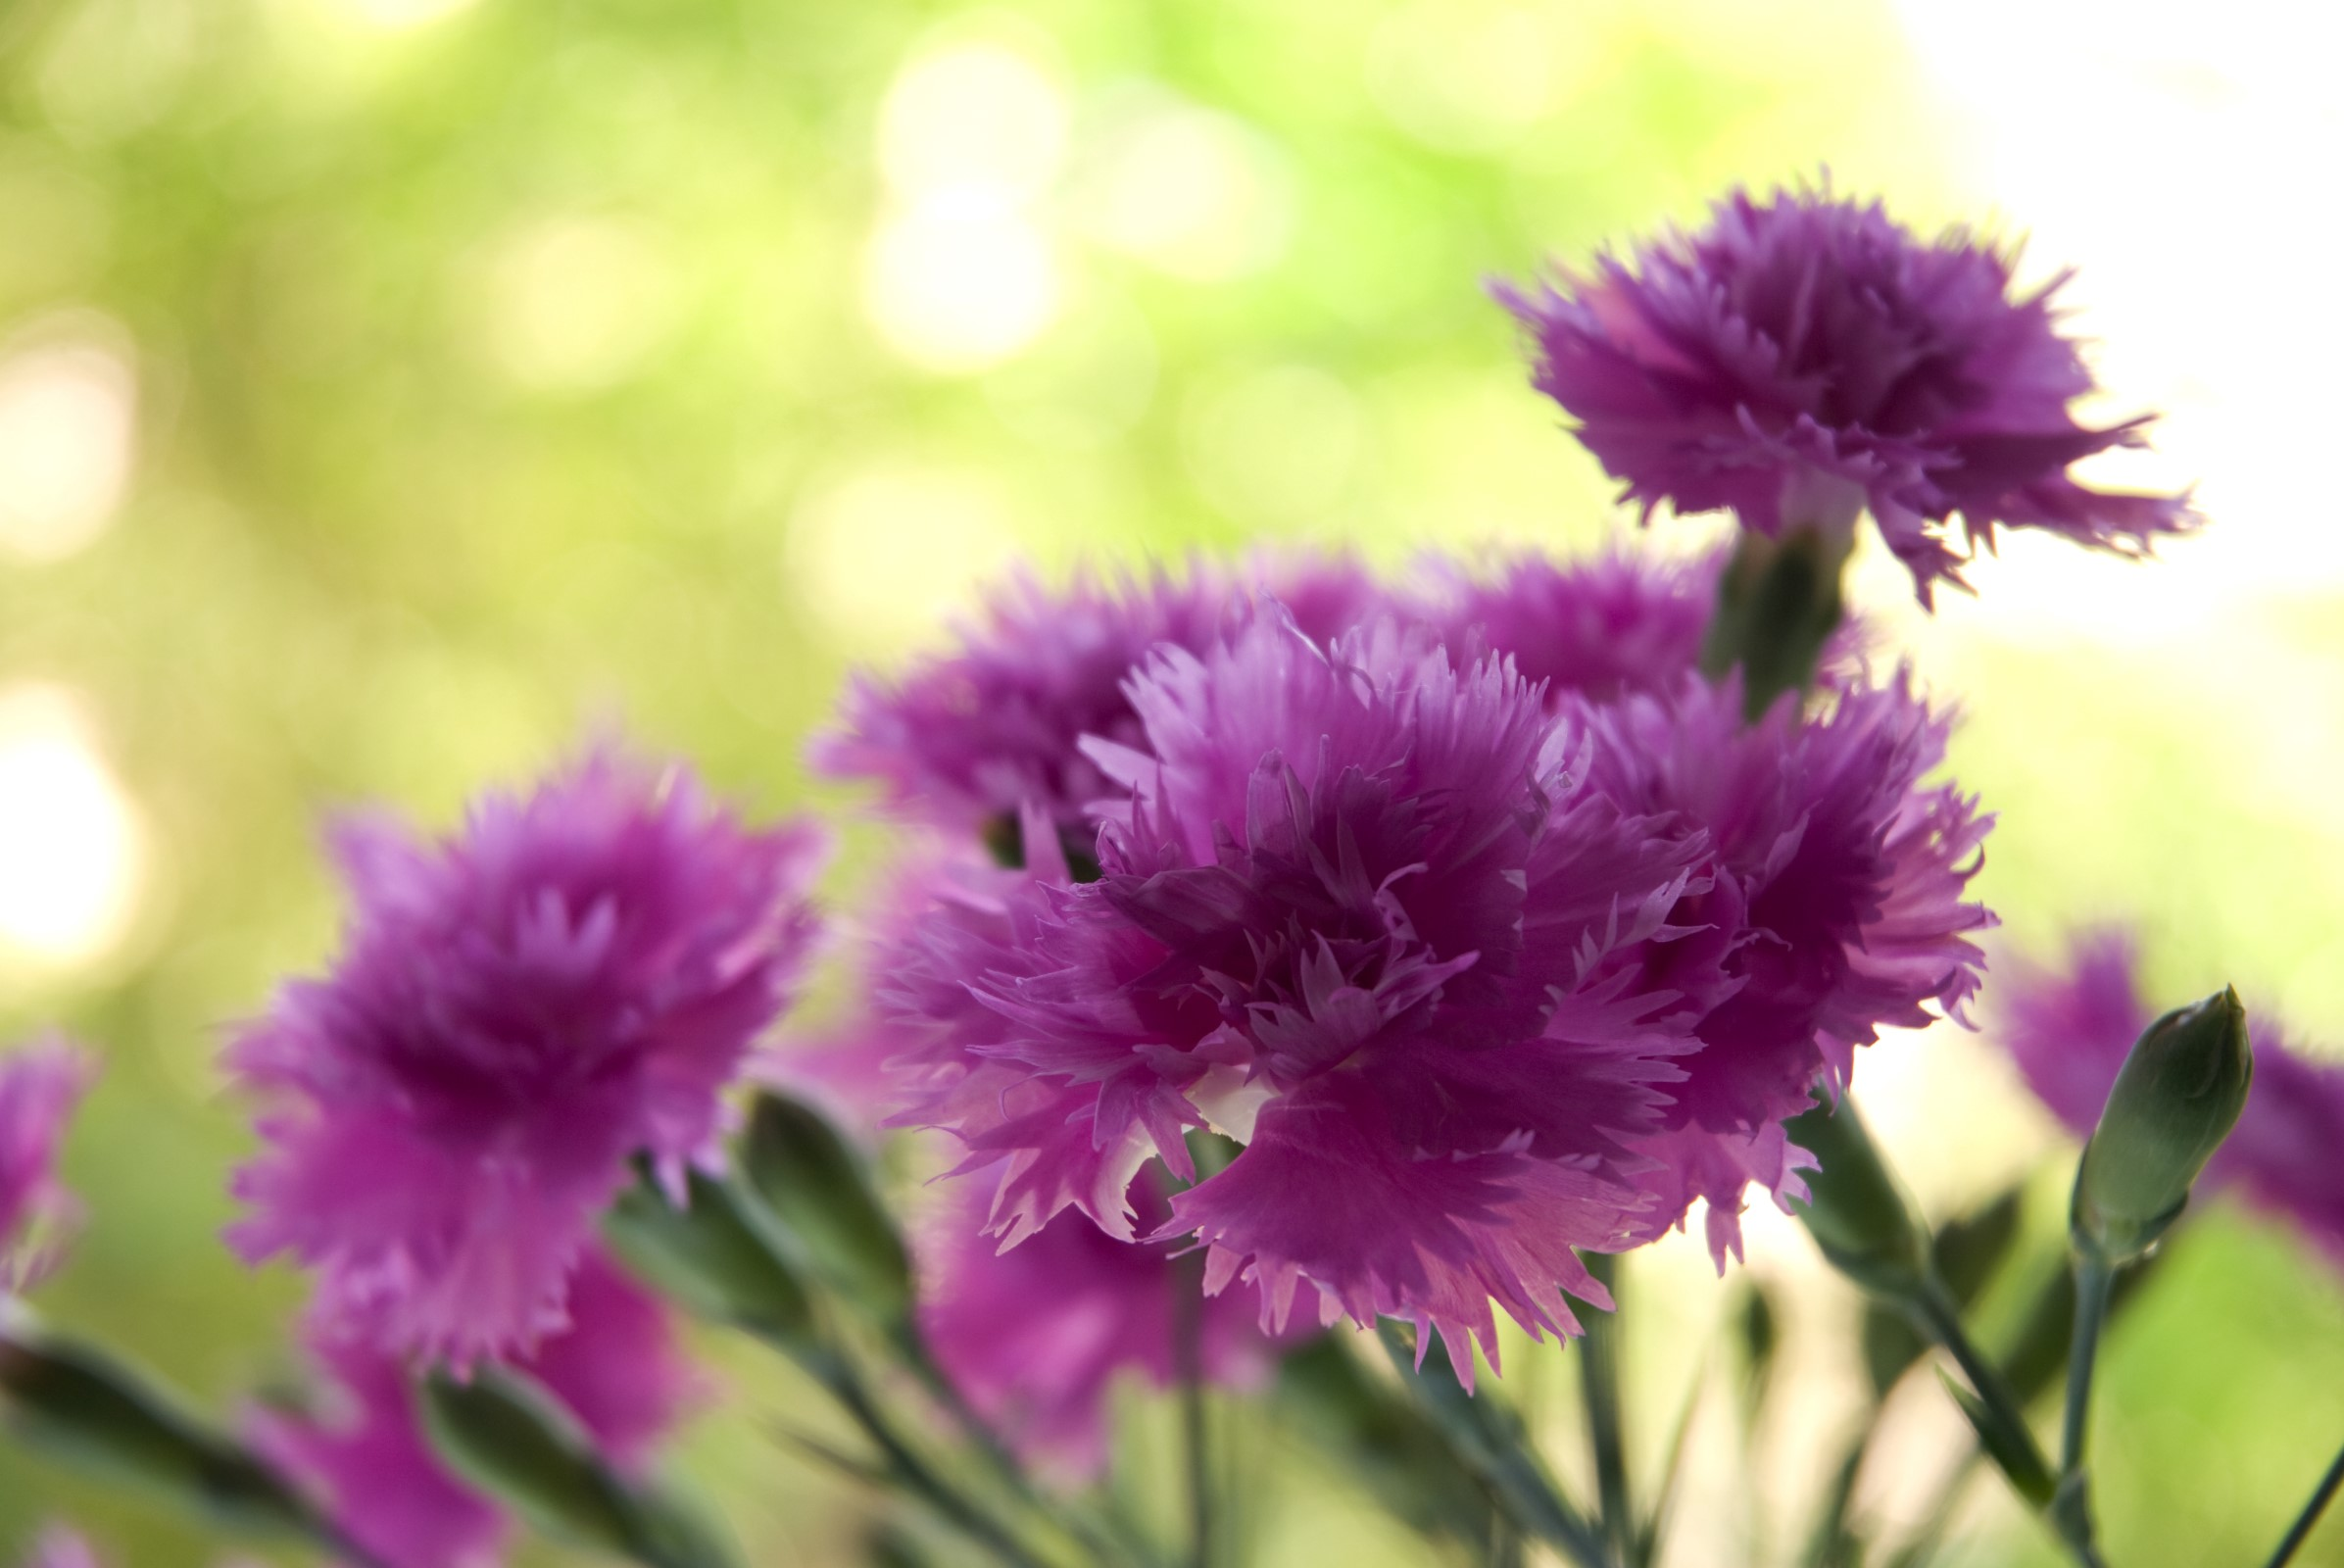 Lilla blomster på stilk.